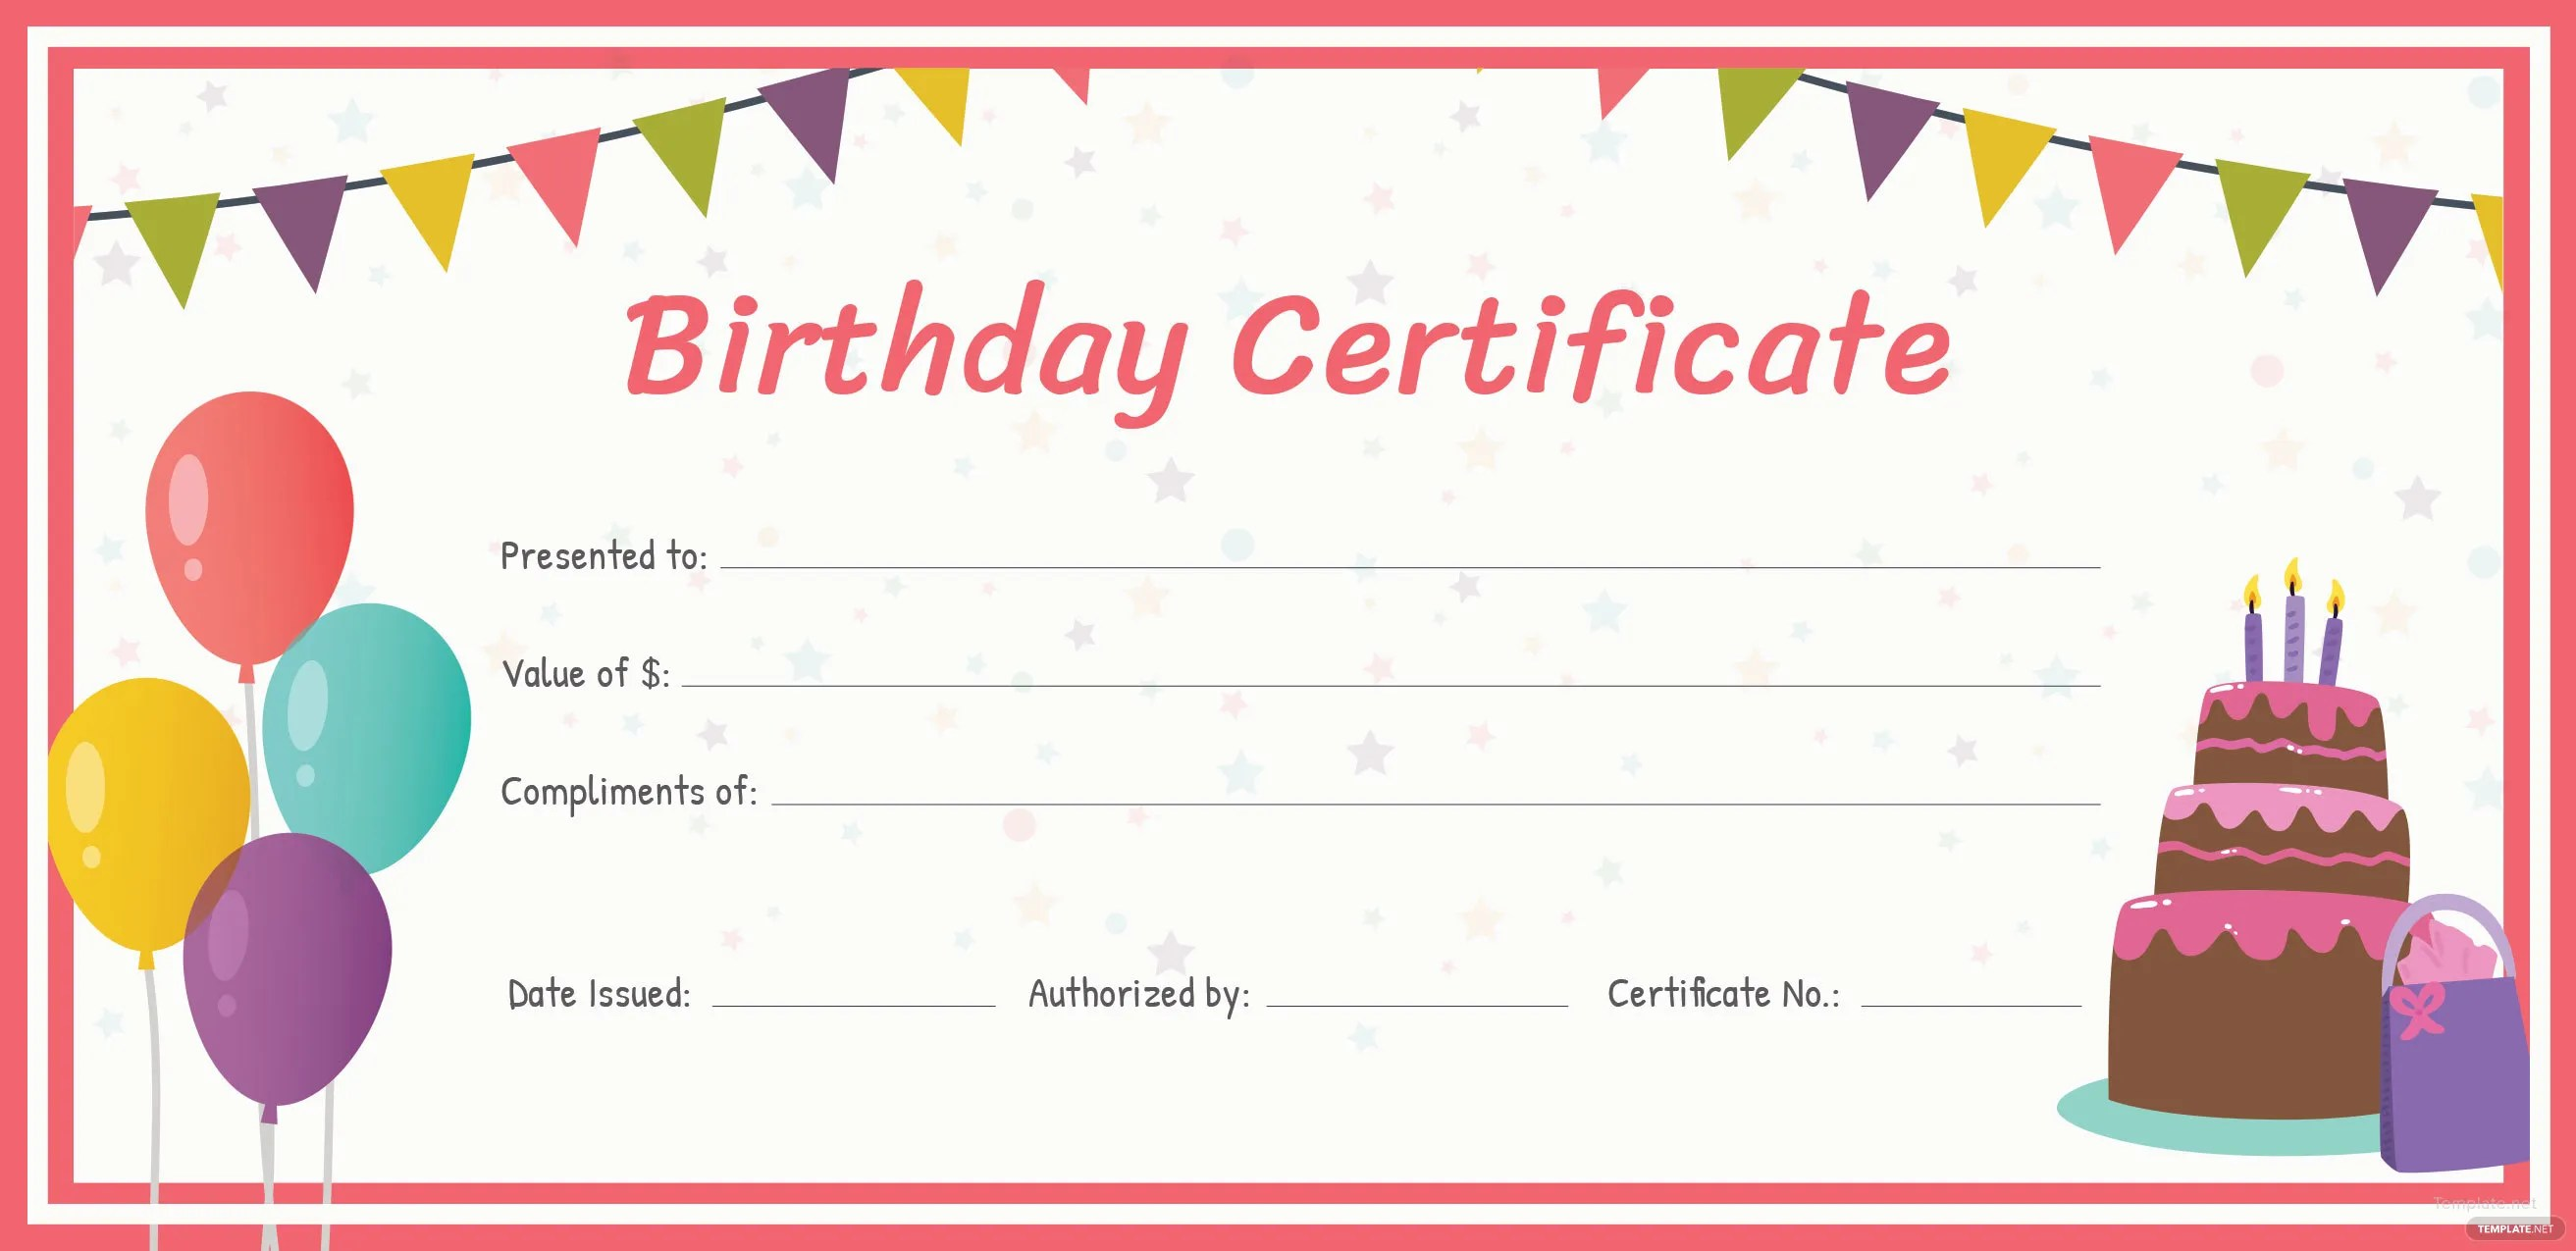 Happy Birthday Gift Certificate Print